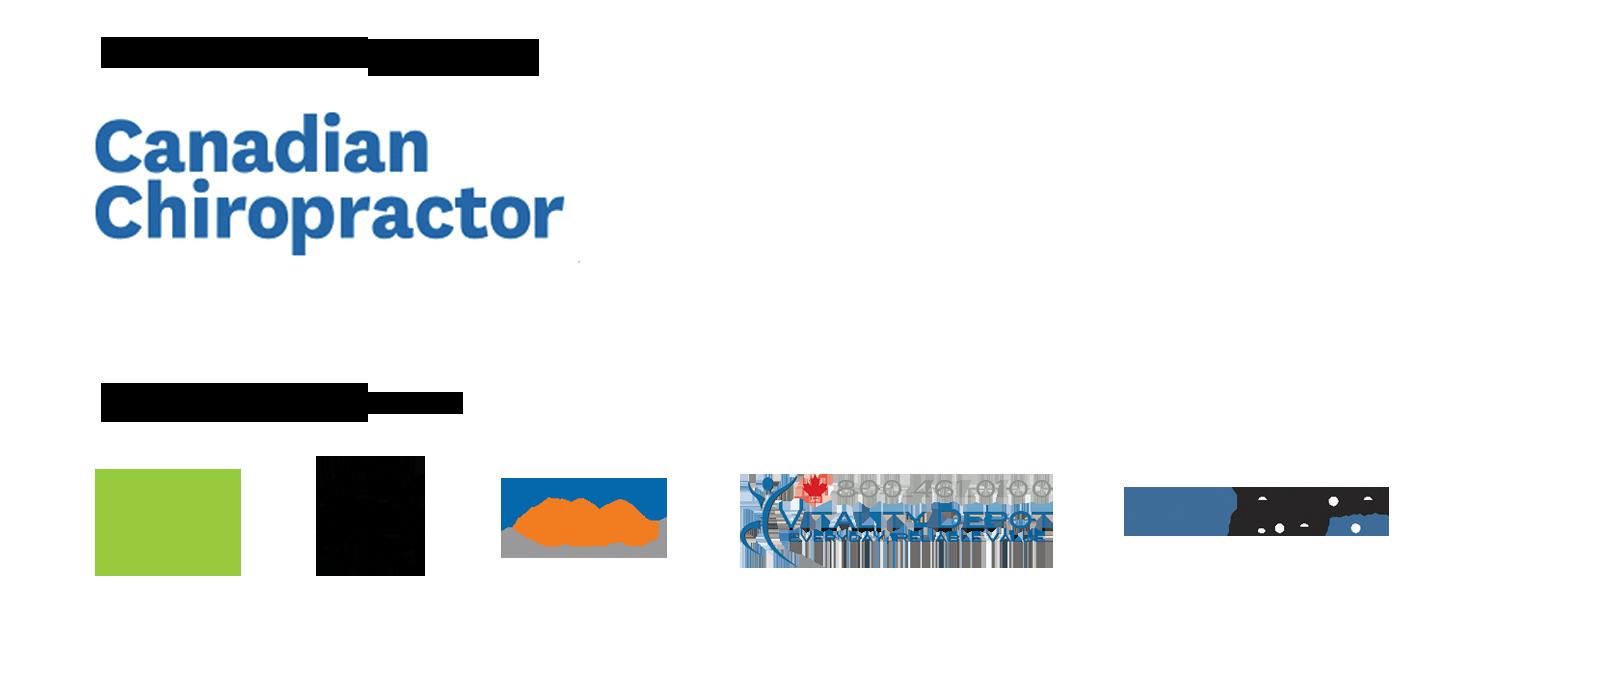 3737-canada-vision-sponsors3-20